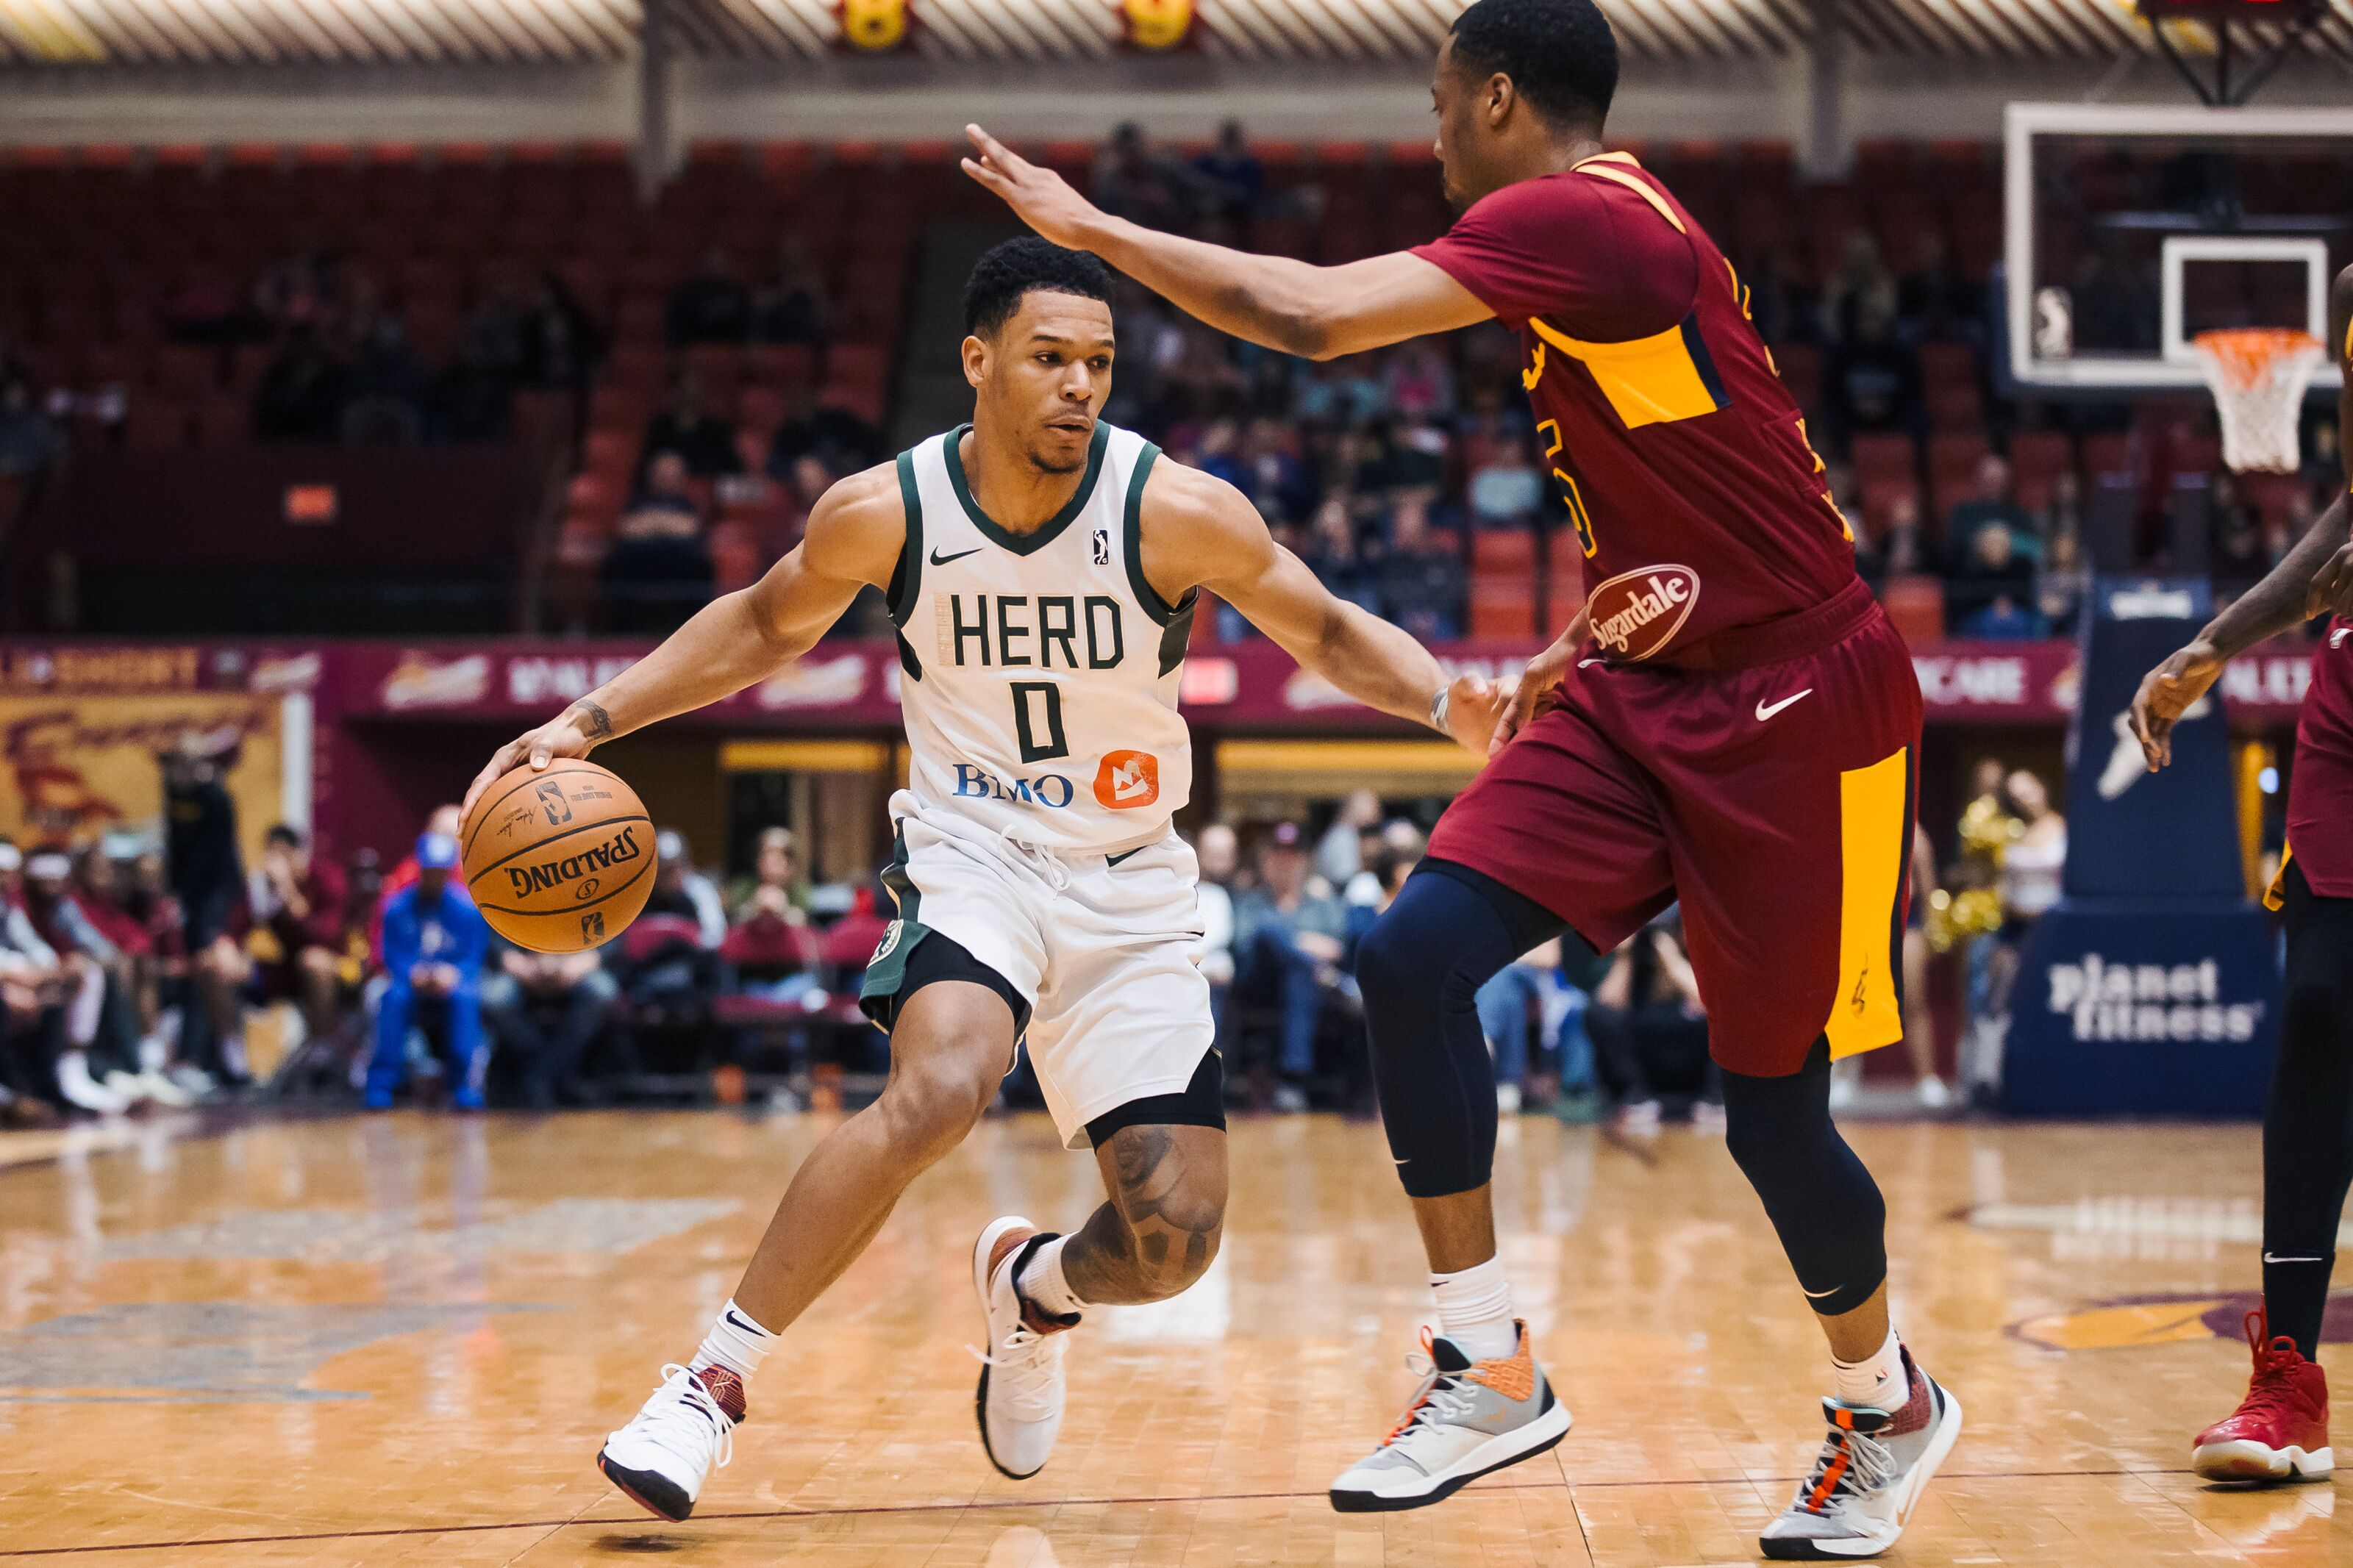 Philadelphia 76ers: Trevon Duval should be a training camp option